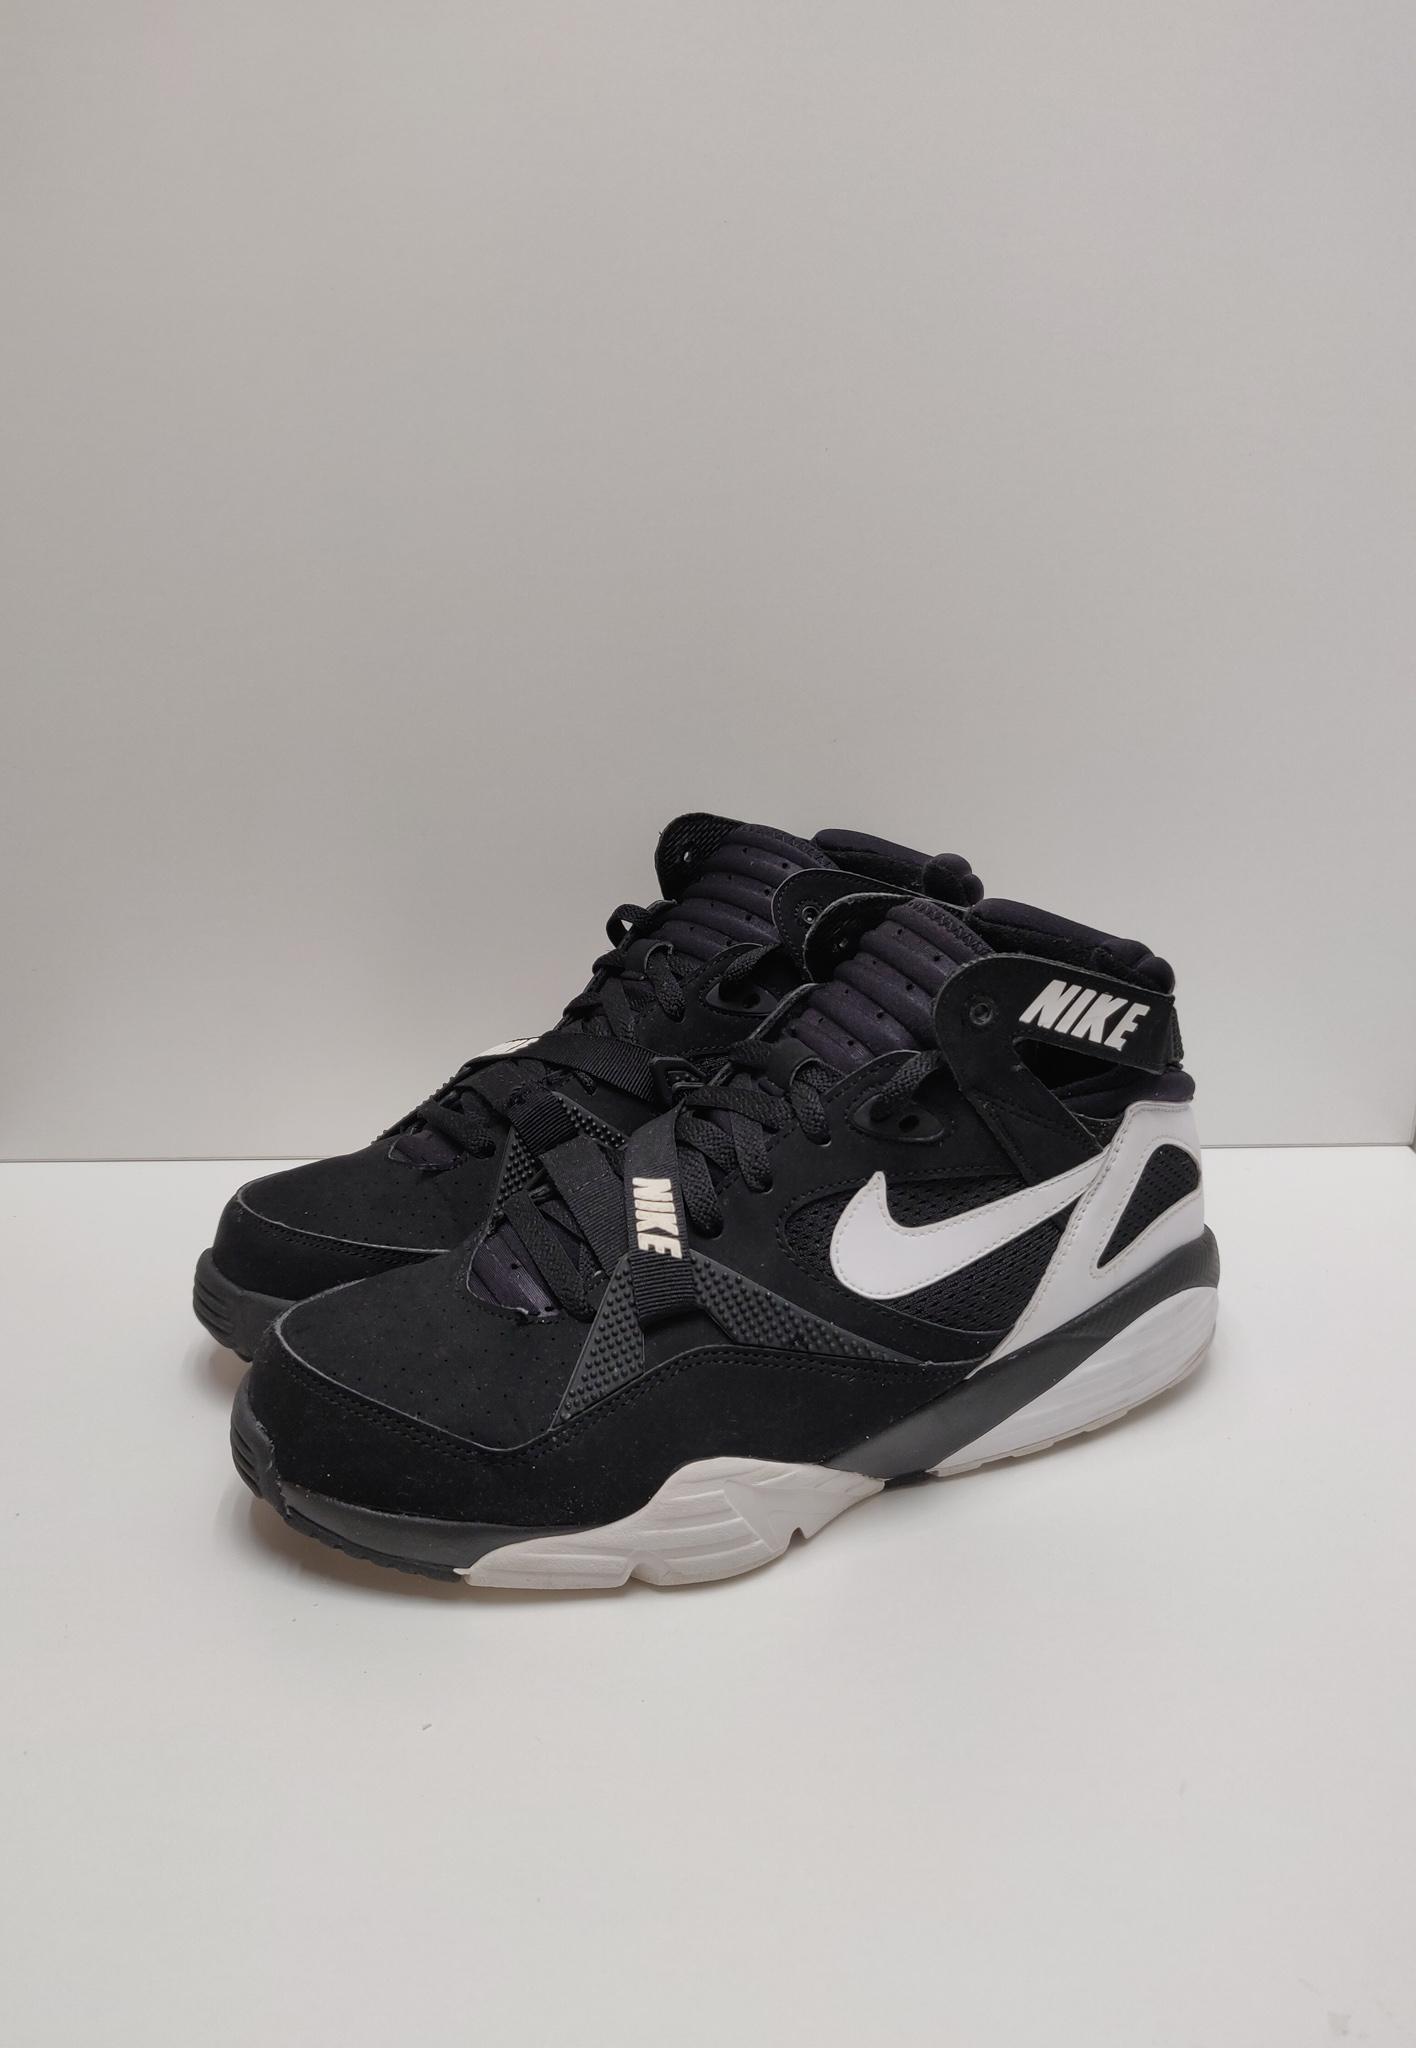 Nike Air Trainer Max '91 Black White